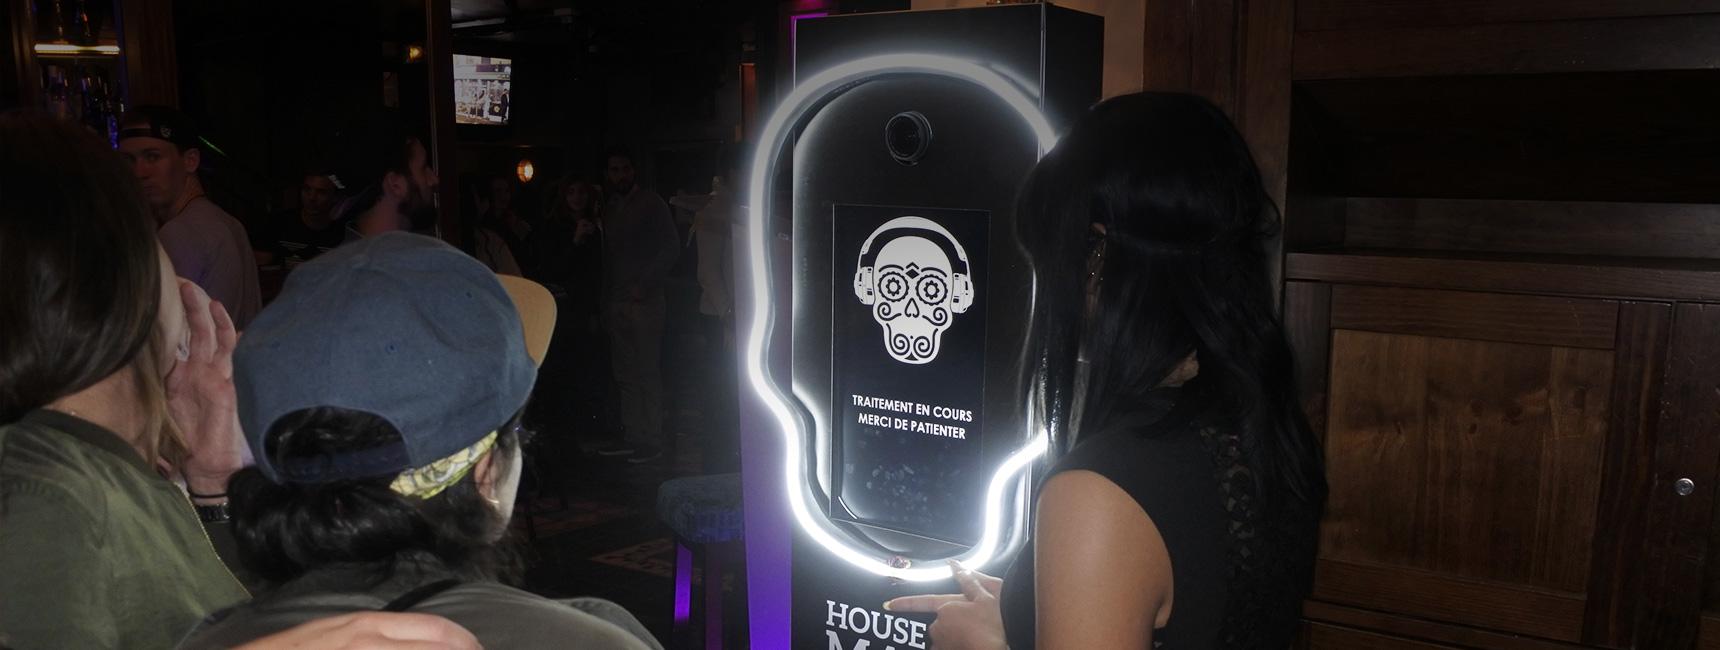 Animations soirées house of mask avec Cubanisto - Keemia Shopper Marketing - Agence d'activation shopper marketing phygitale